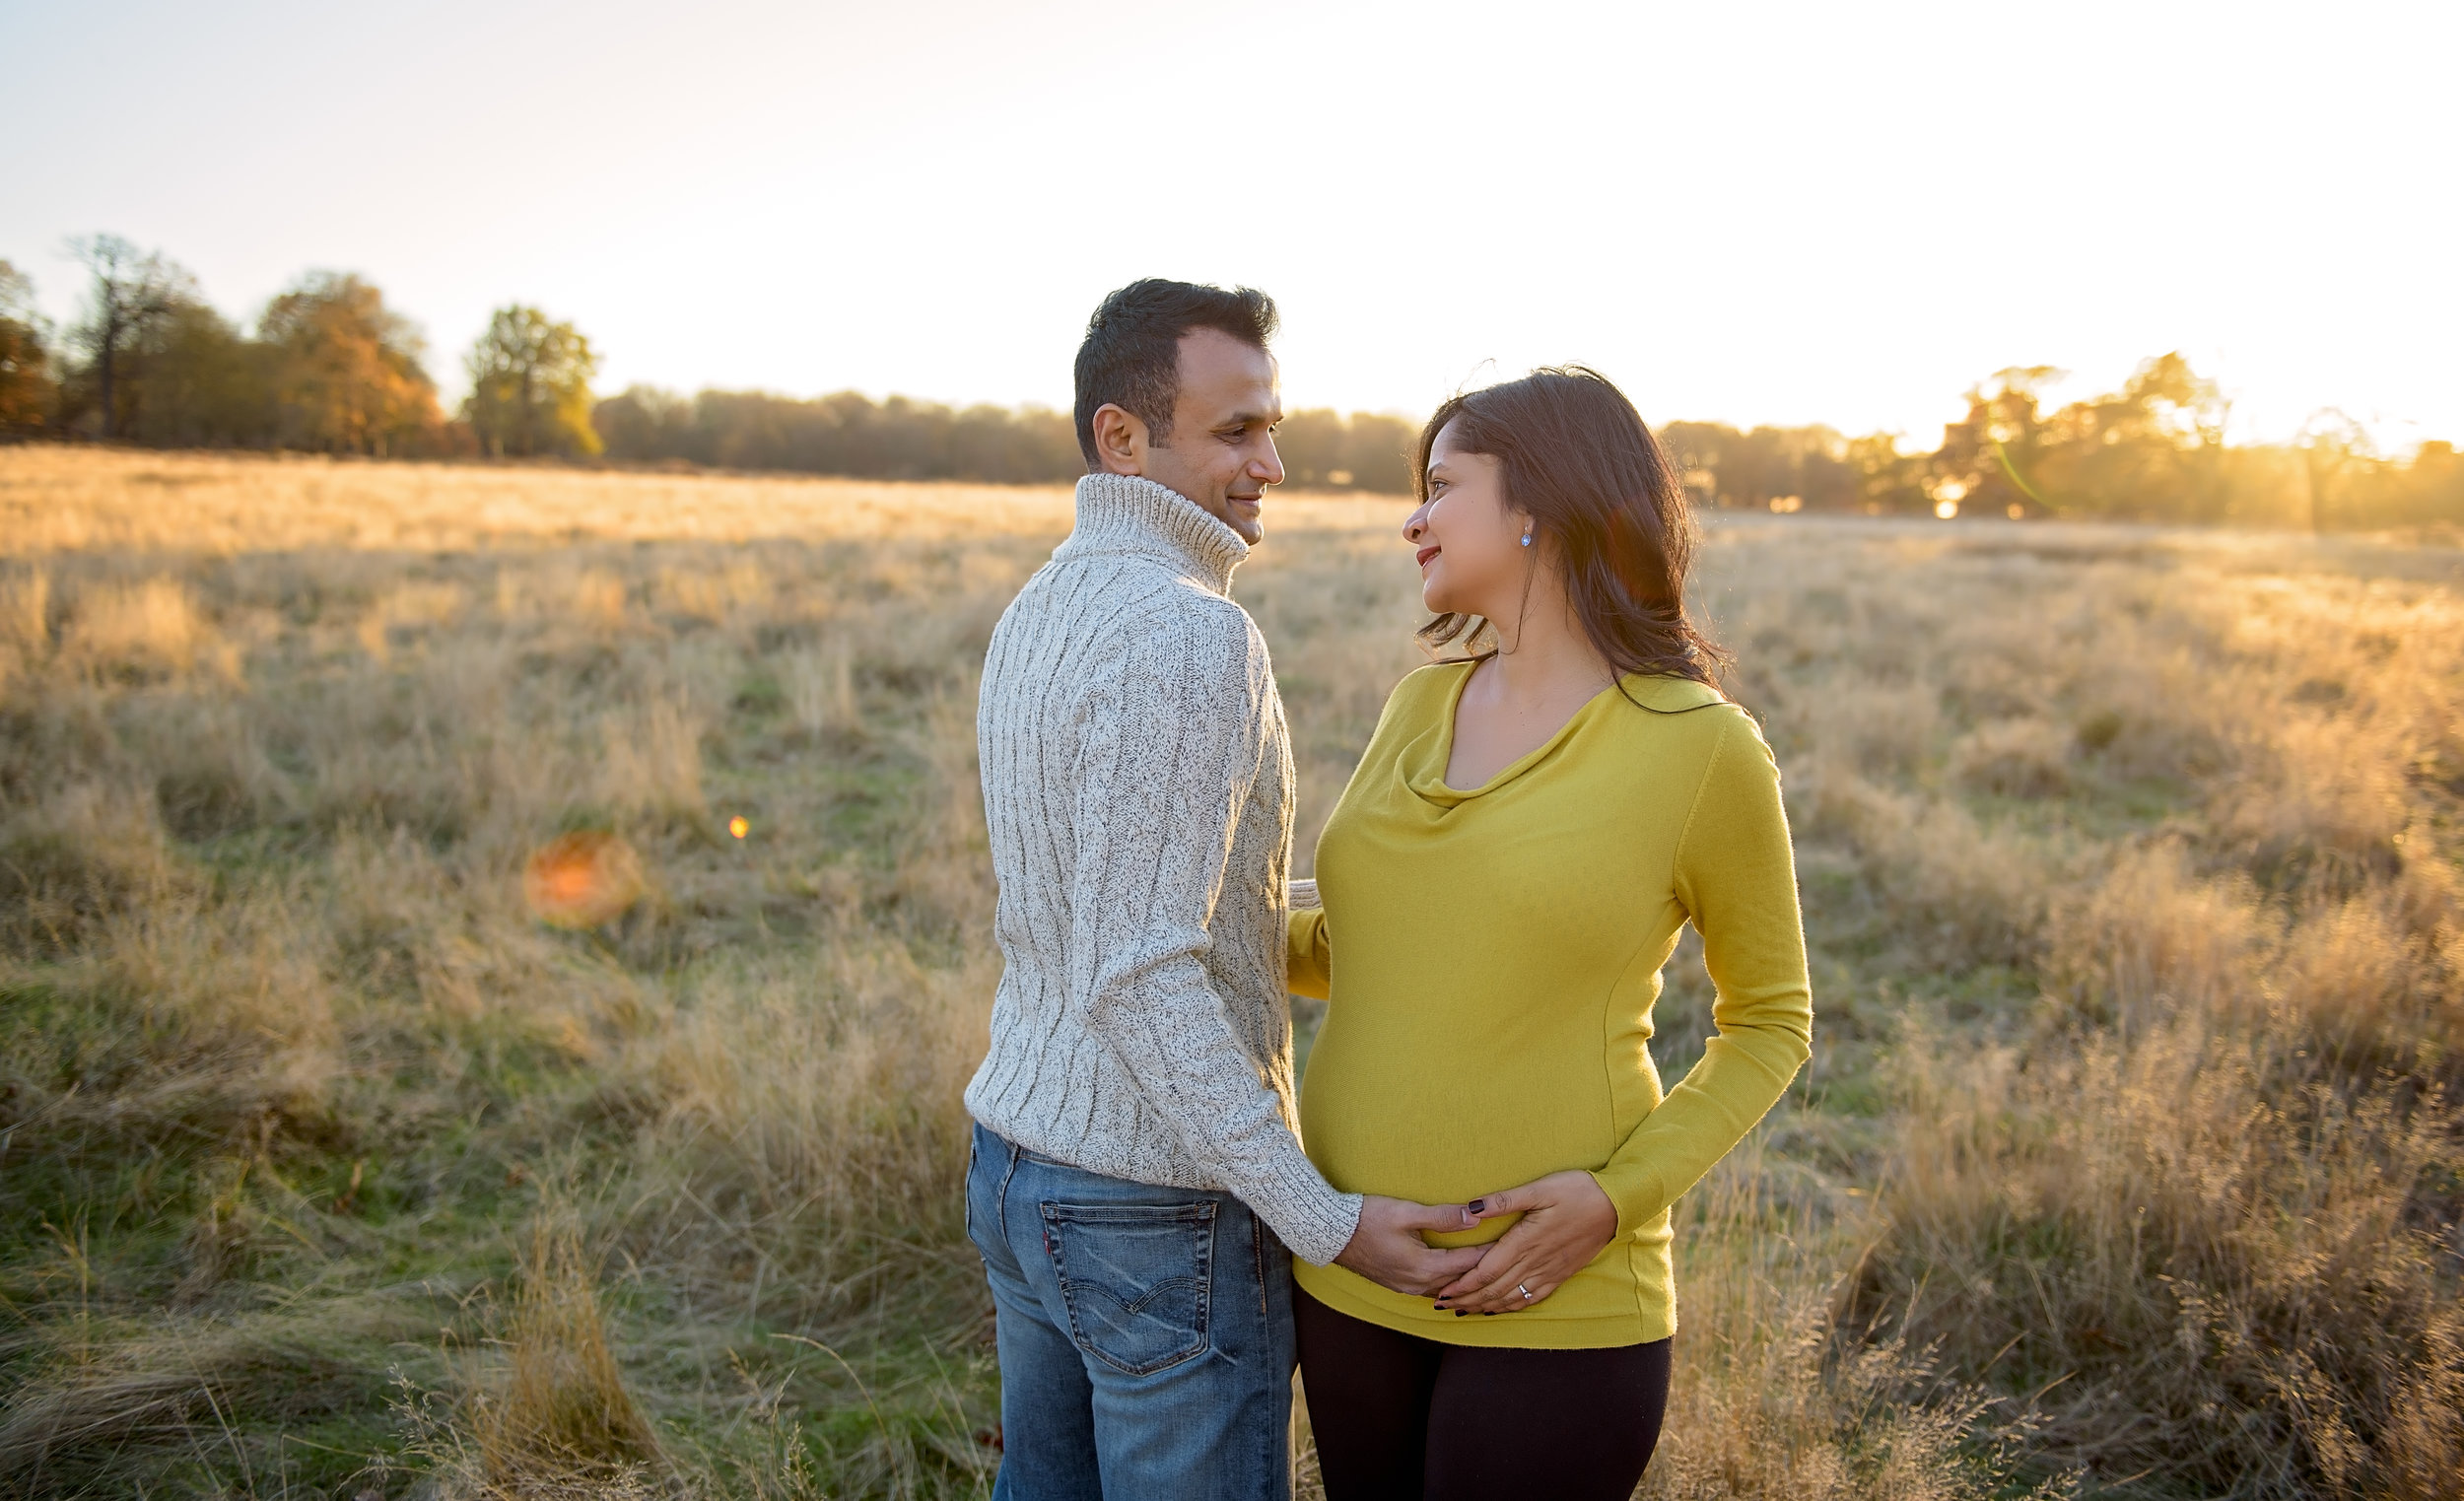 Posing ideas for pregnancy photoshoot